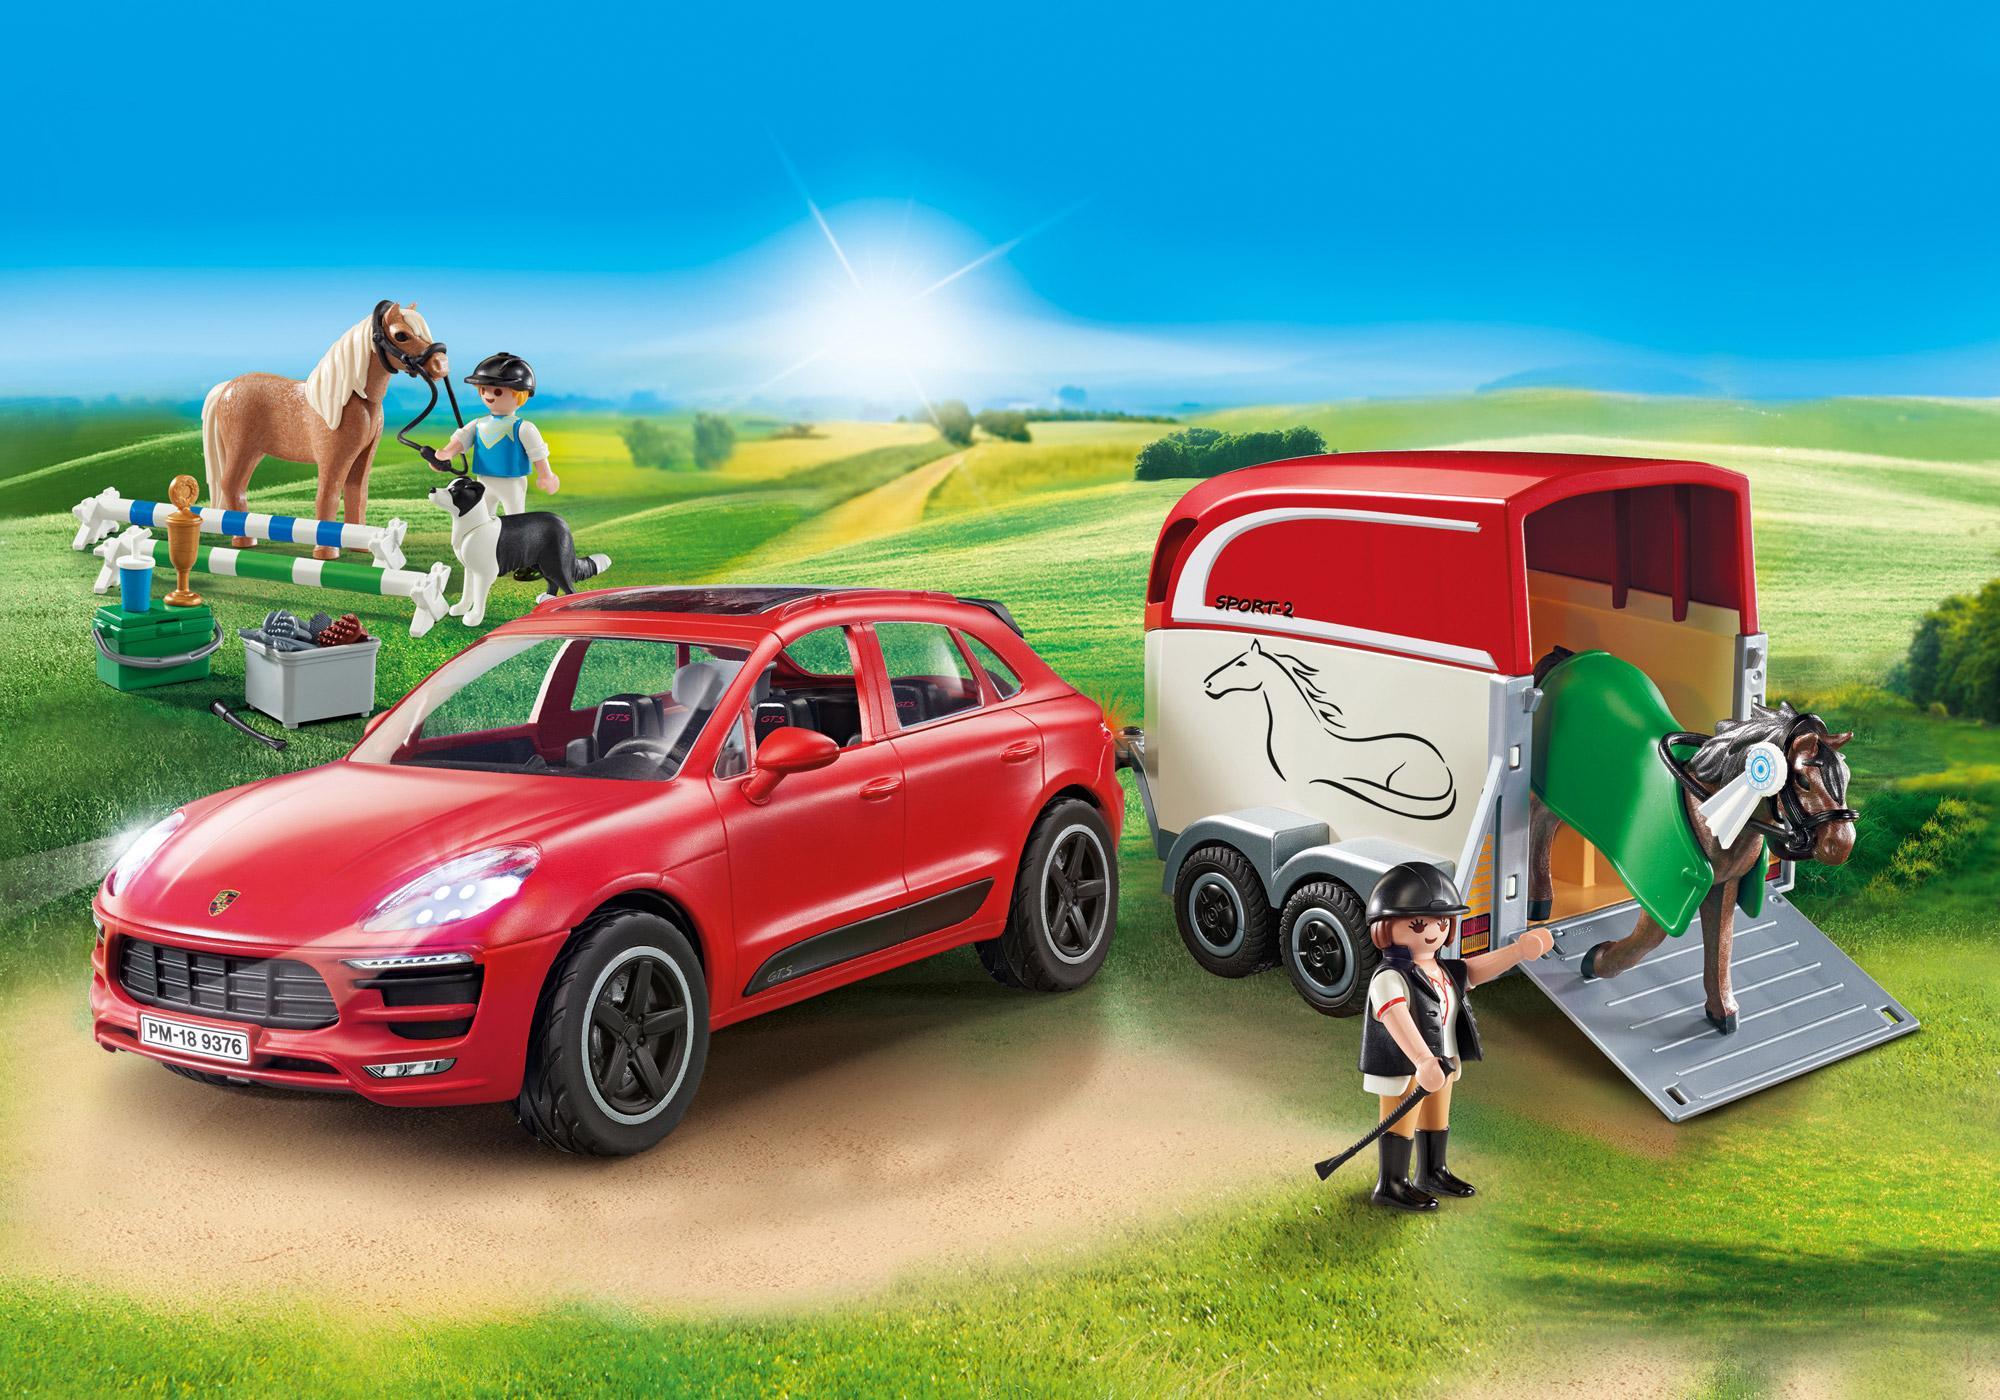 http://media.playmobil.com/i/playmobil/9376_product_detail/Porsche Macan GTS